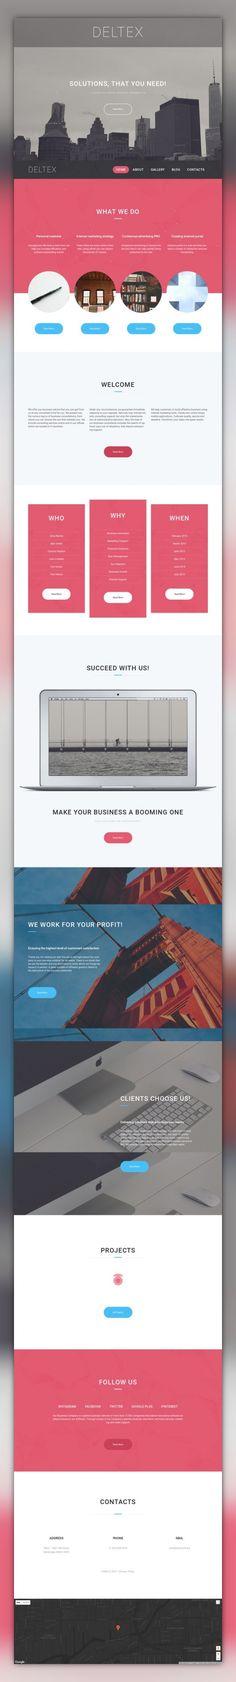 Deltex WordPress Theme CMS & Blog Templates, WordPress Themes, Business & Services